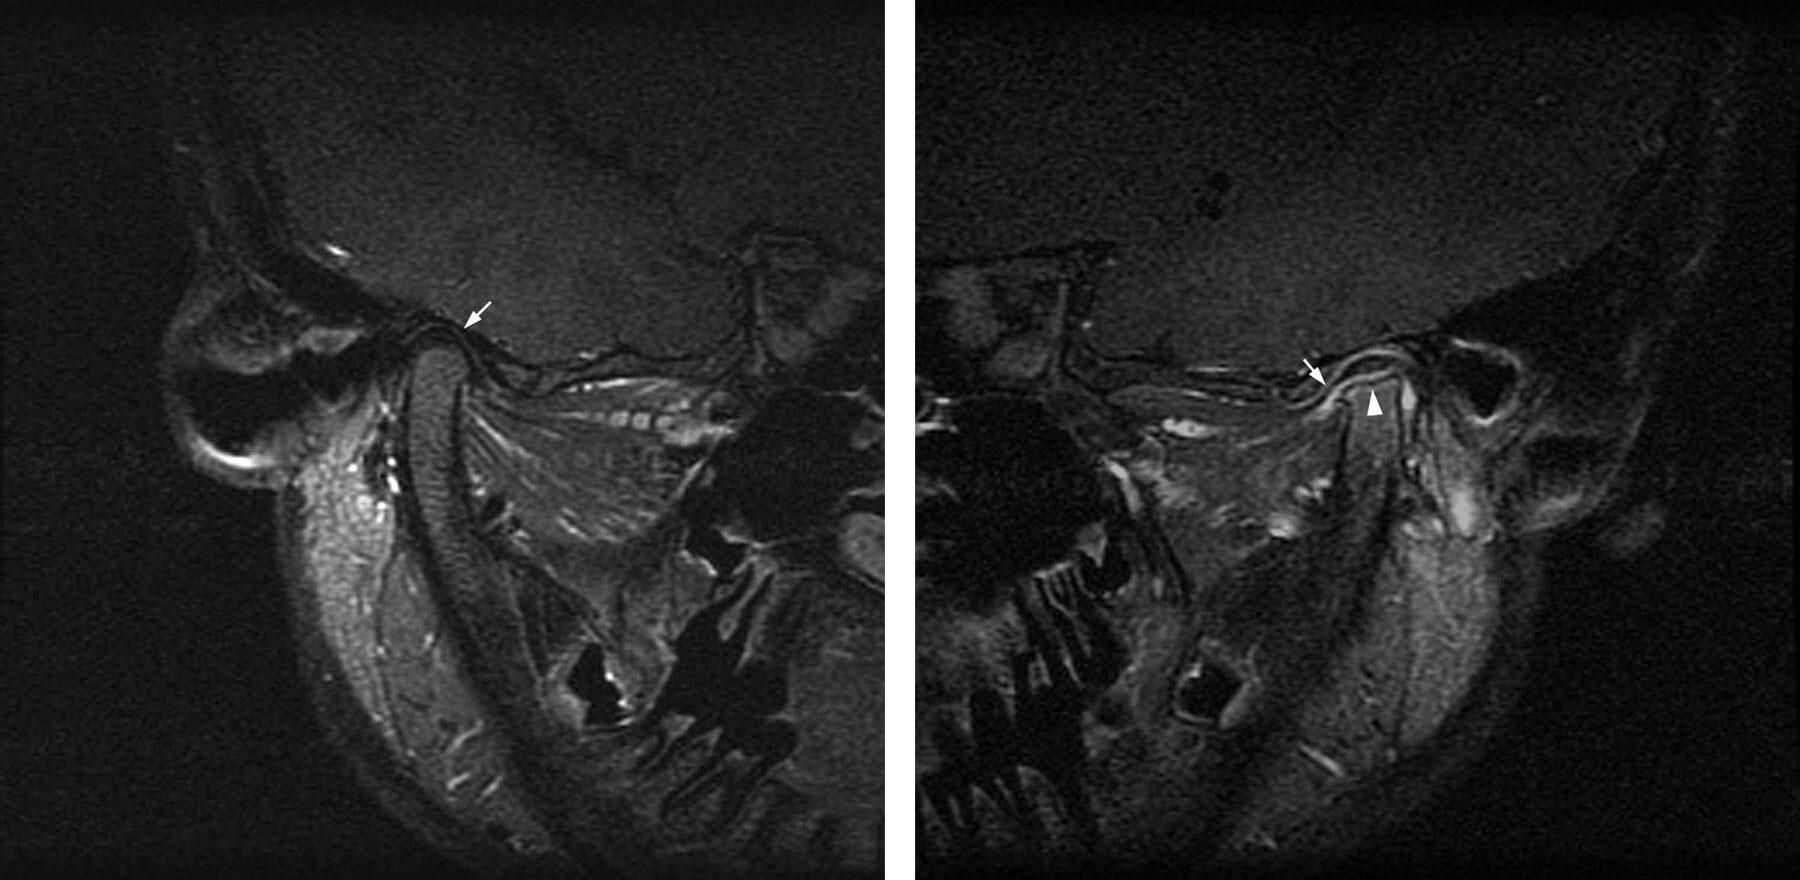 Артроз височно нижнечелюстного сустава (ВНЧС) - симптомы и лечение